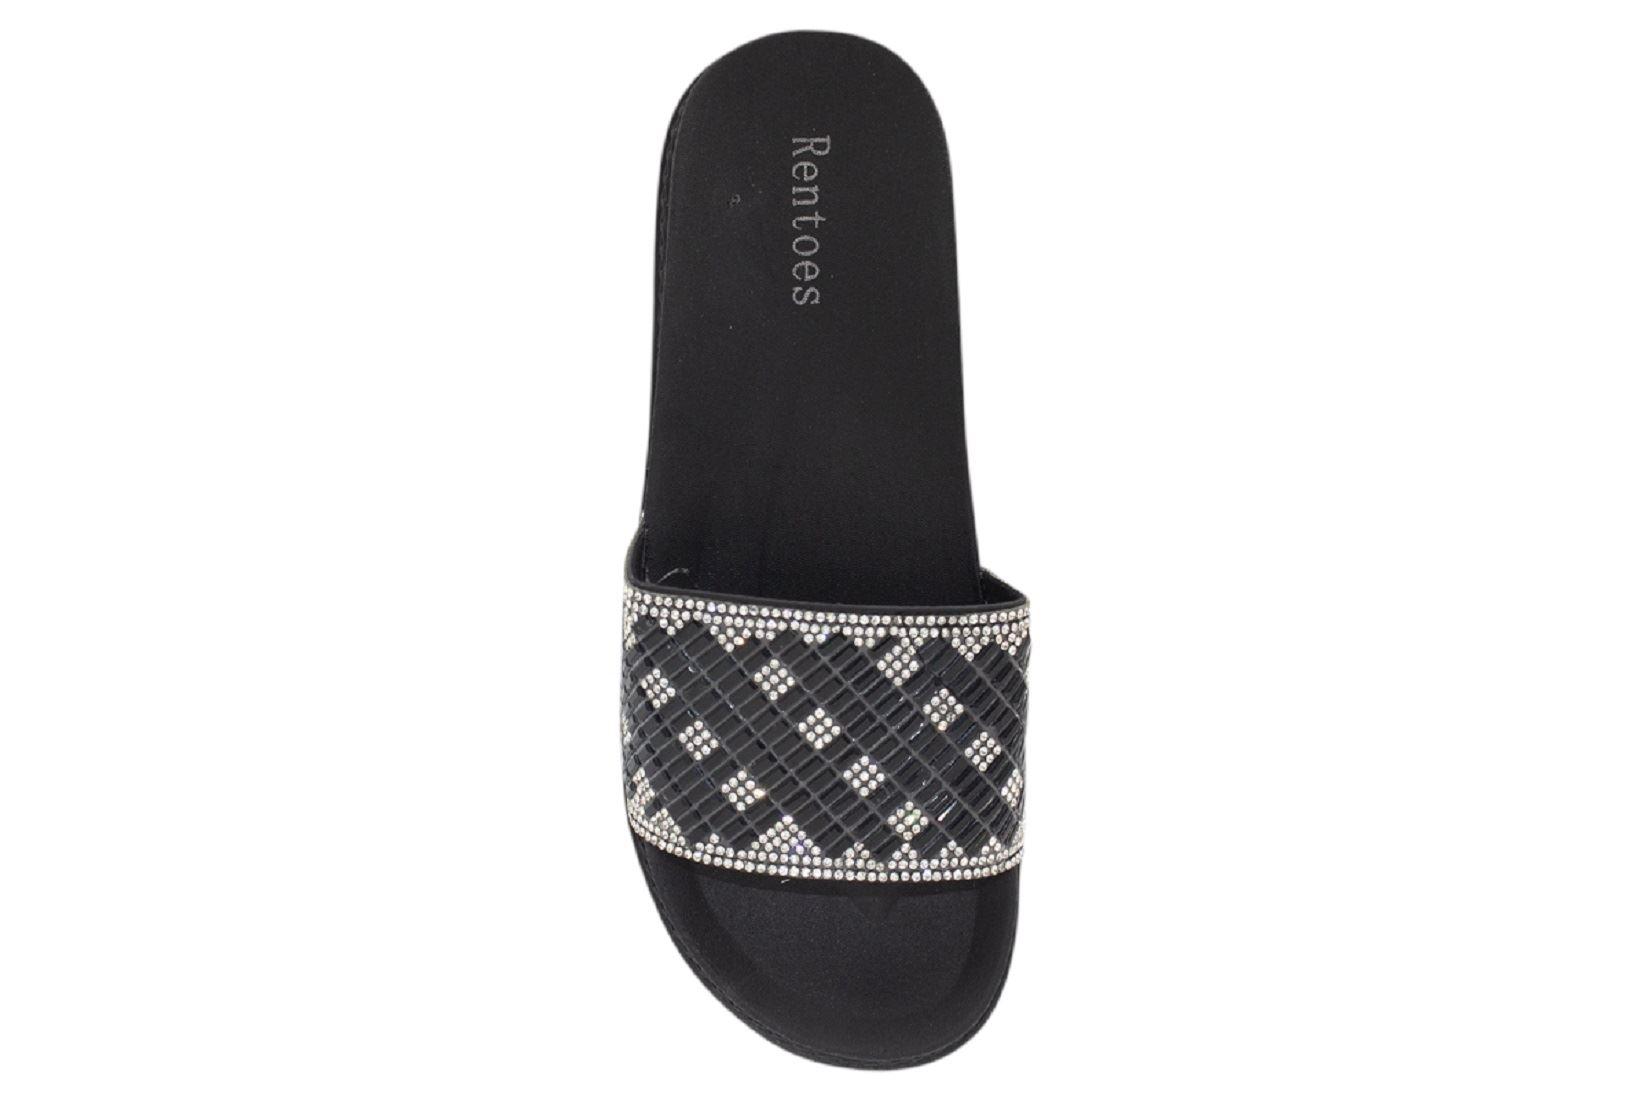 Womens-Sliders-Casual-Slippers-Mules-Ladies-Diamante-Flip-Flop-Sandals-Shoes thumbnail 95